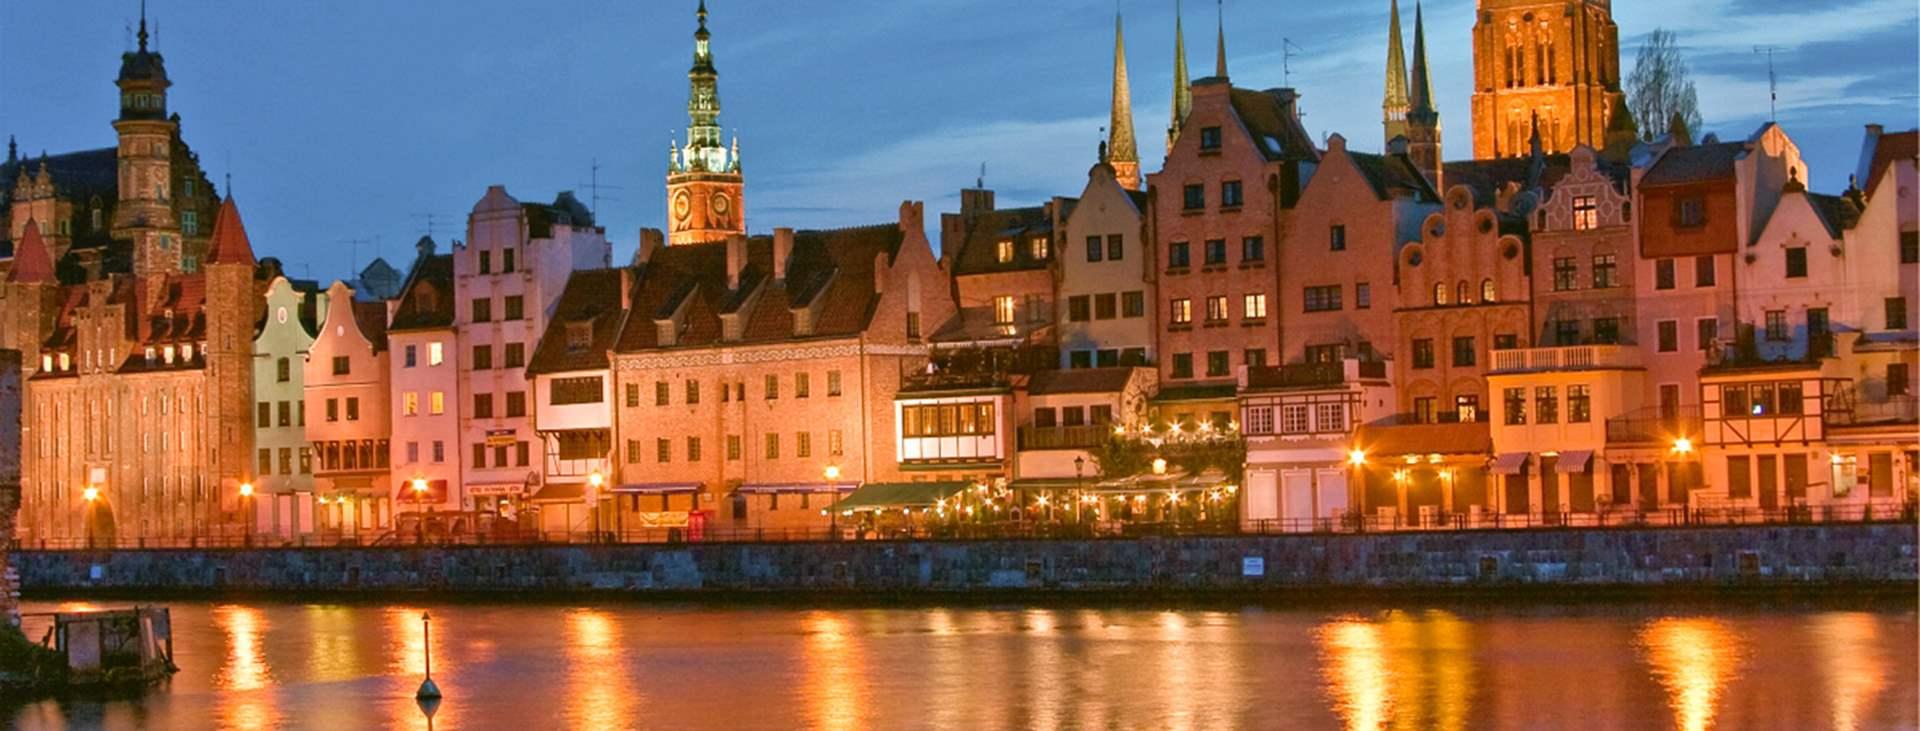 Gdansk Kaupunkilomat Ja Matkat Lennot Ja Hotellit Tjareborg